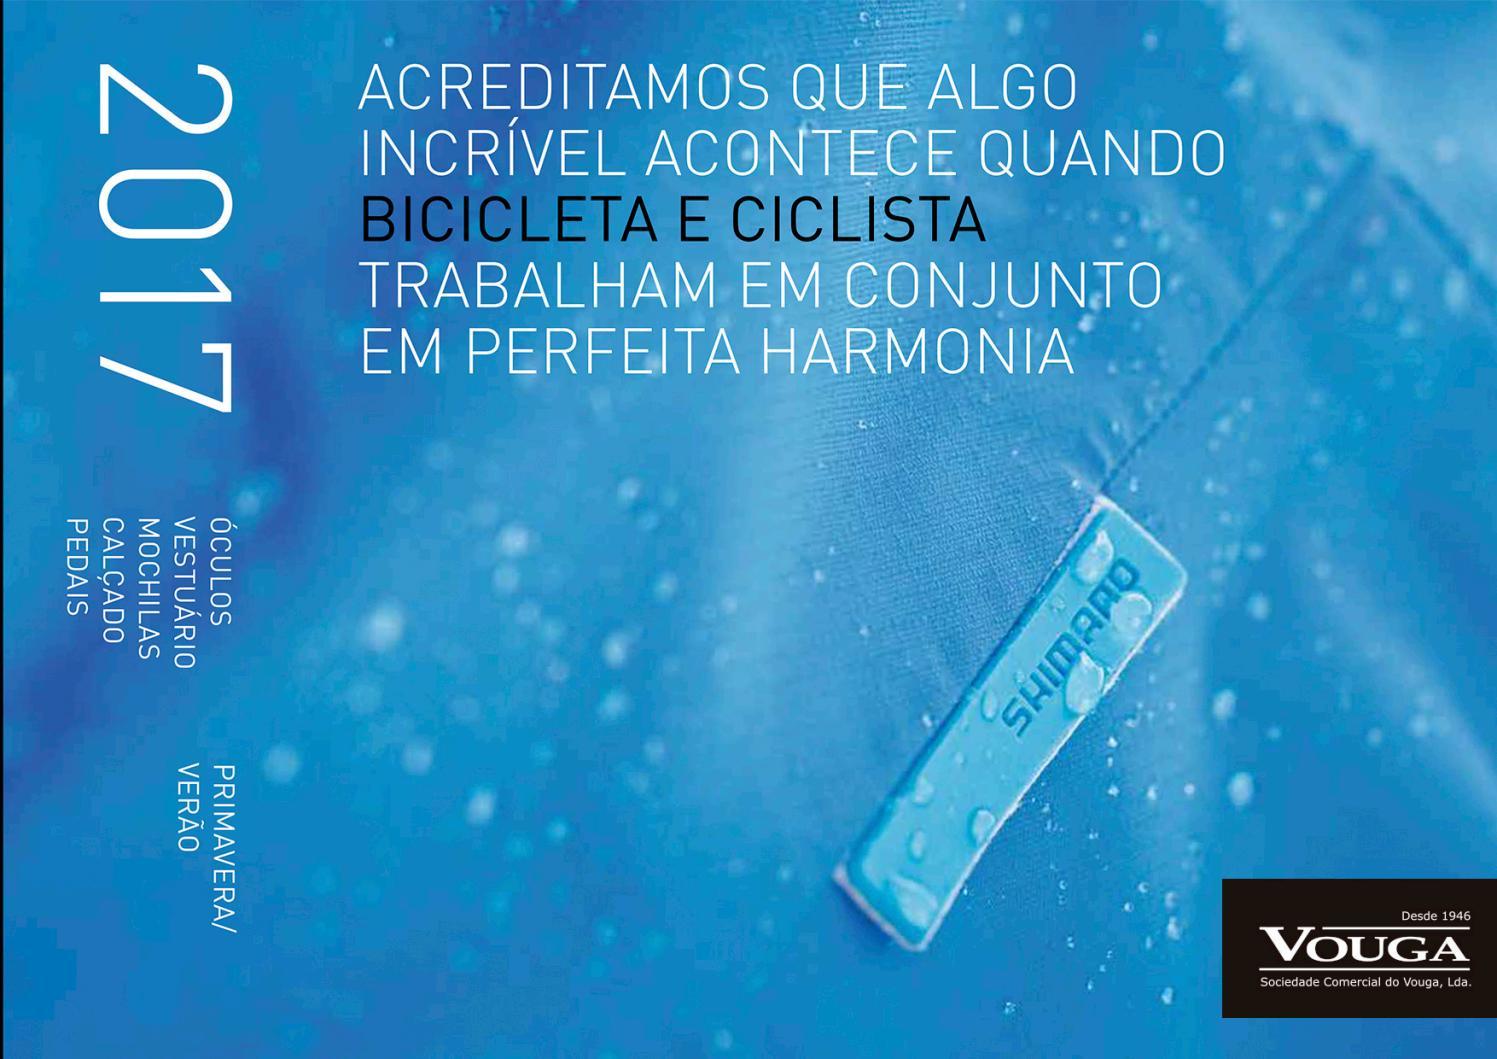 Catálogo Acessórios Shimano 2017 by BTT Lobo - issuu 5963970a5b